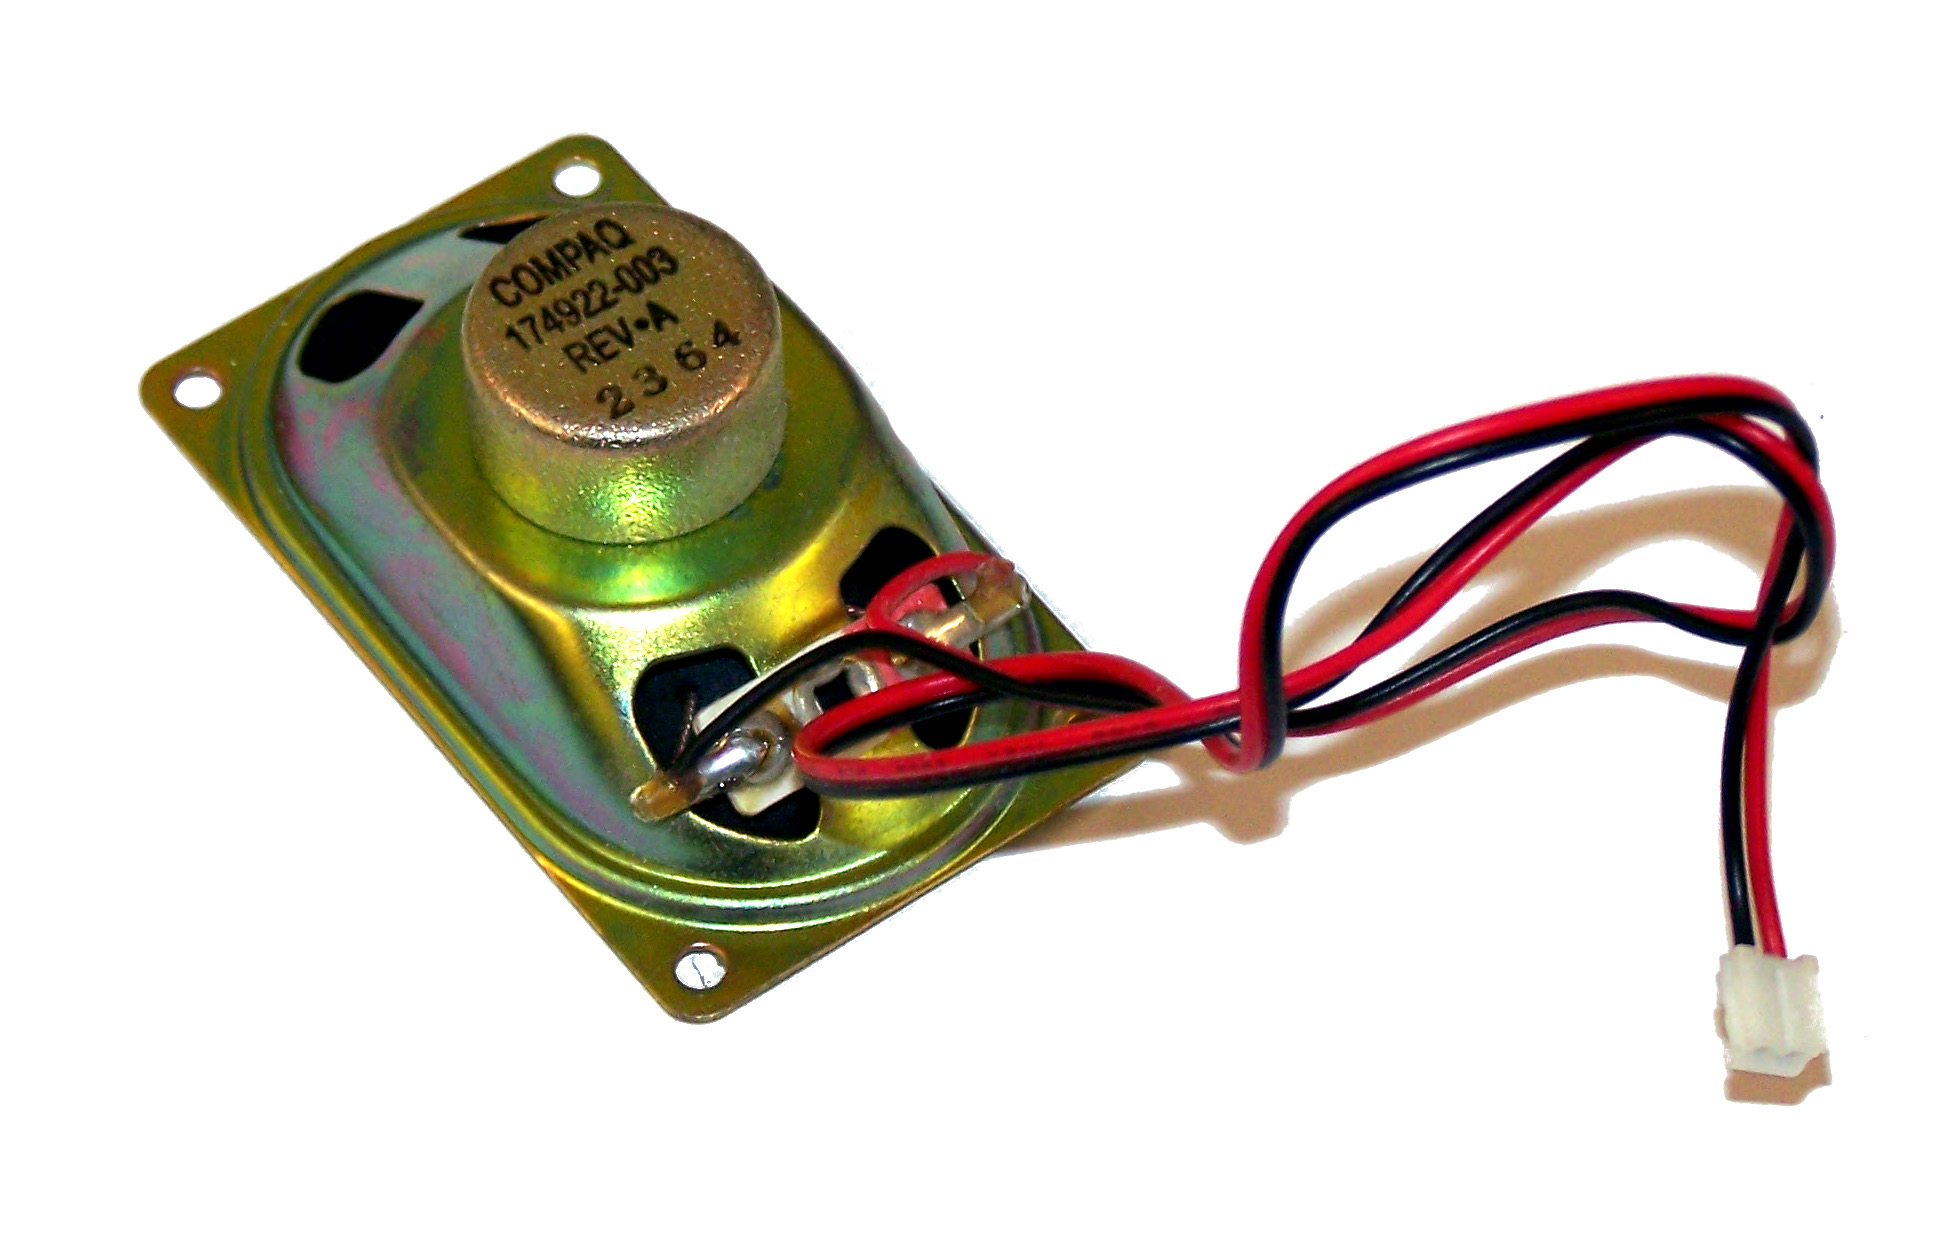 Compaq 174922-003 Evo D310DT Desktop Internal Speaker Thumbnail 1